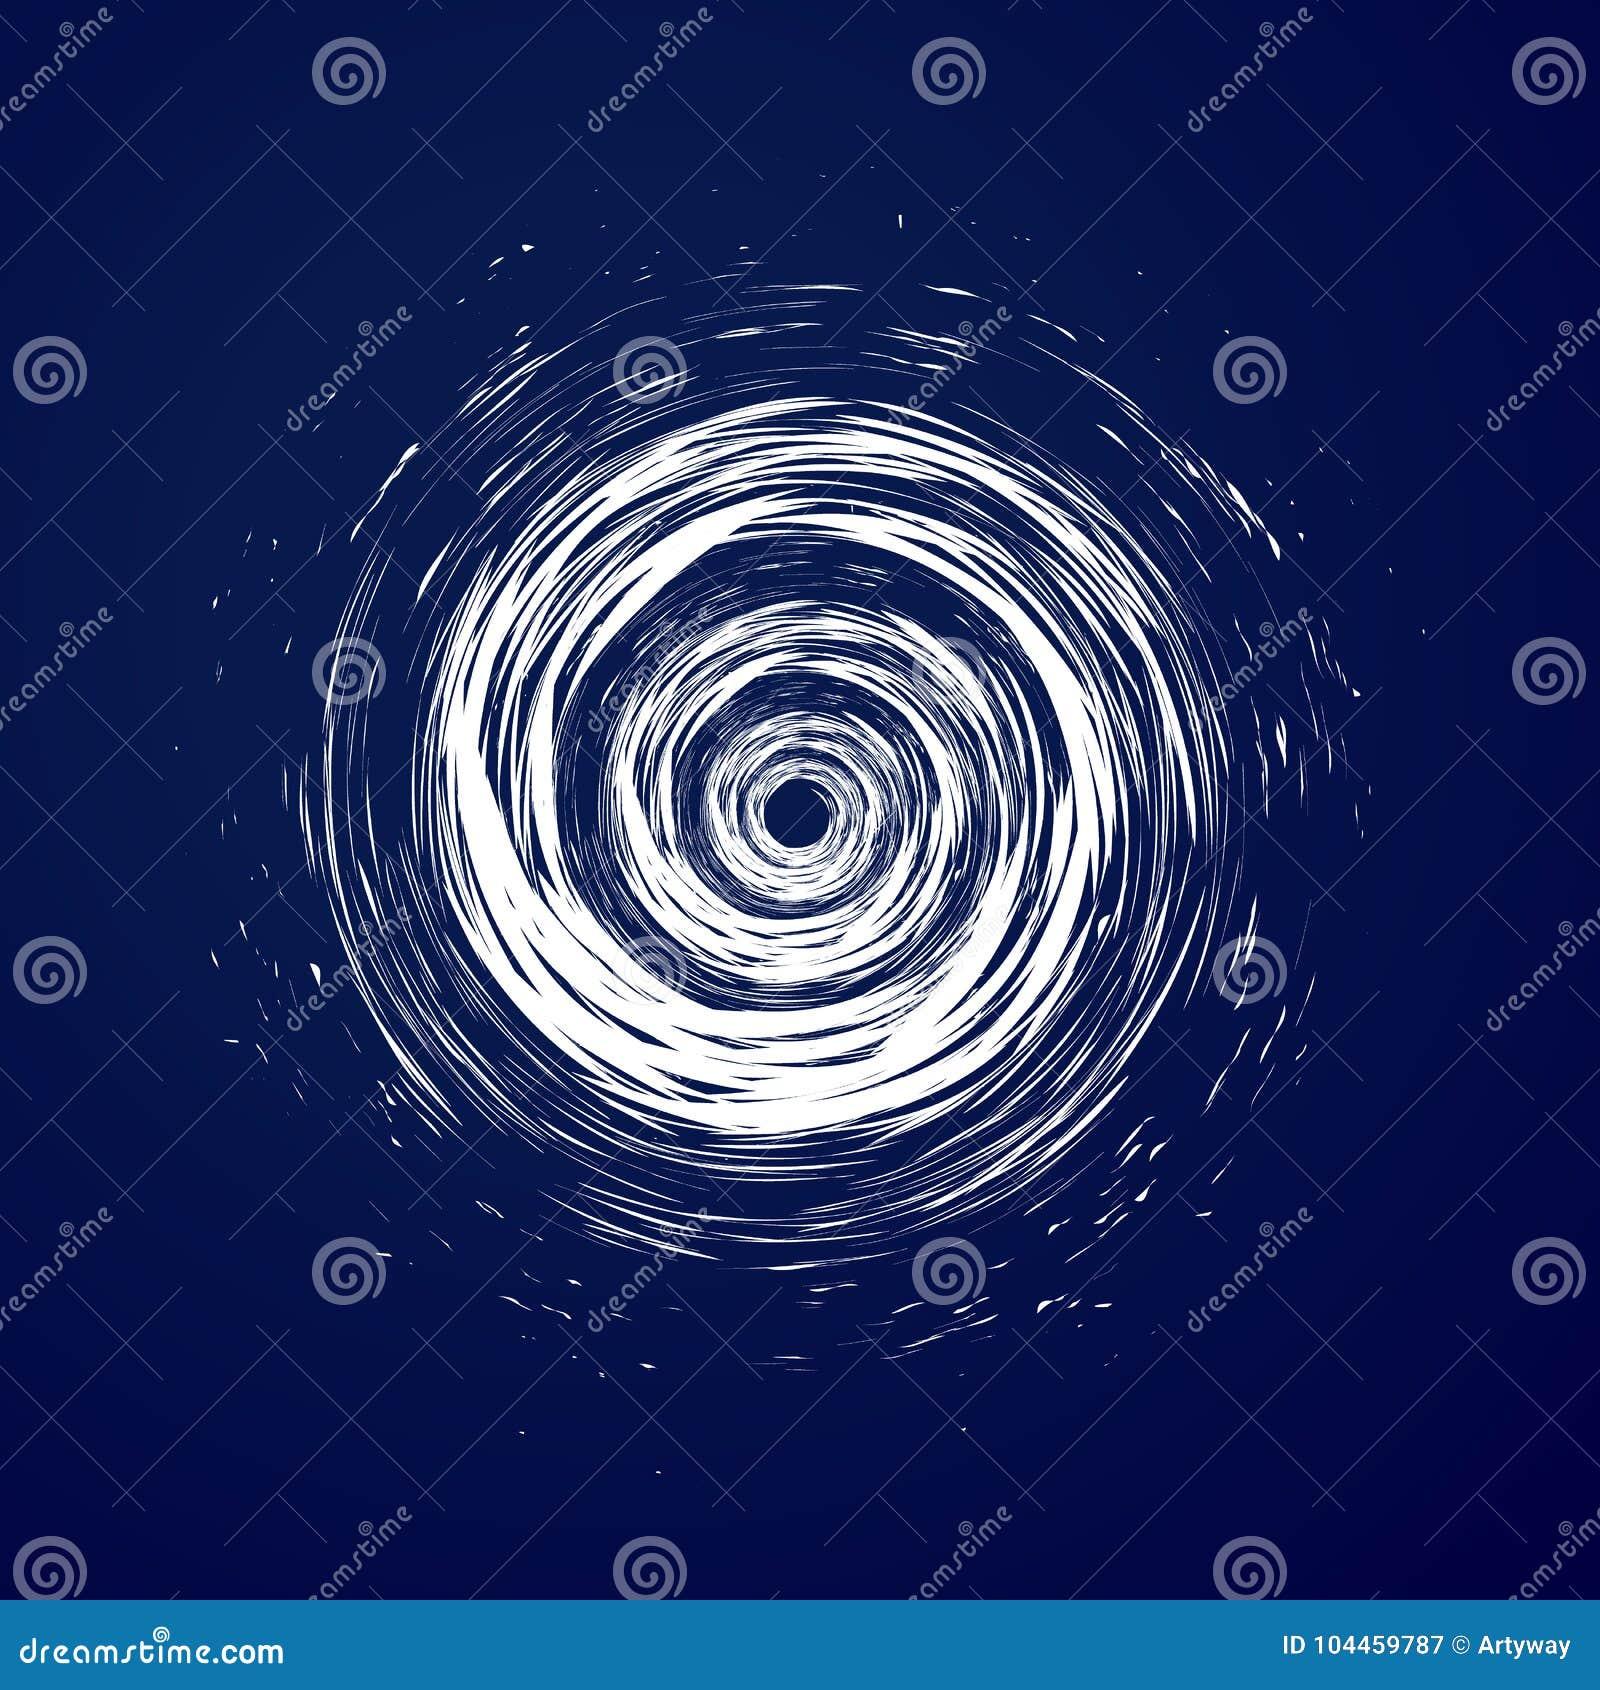 Huge hurricane, tornado, typhoon, white swirl clouds, twister on blue sea background top view. Danger cyclone vector